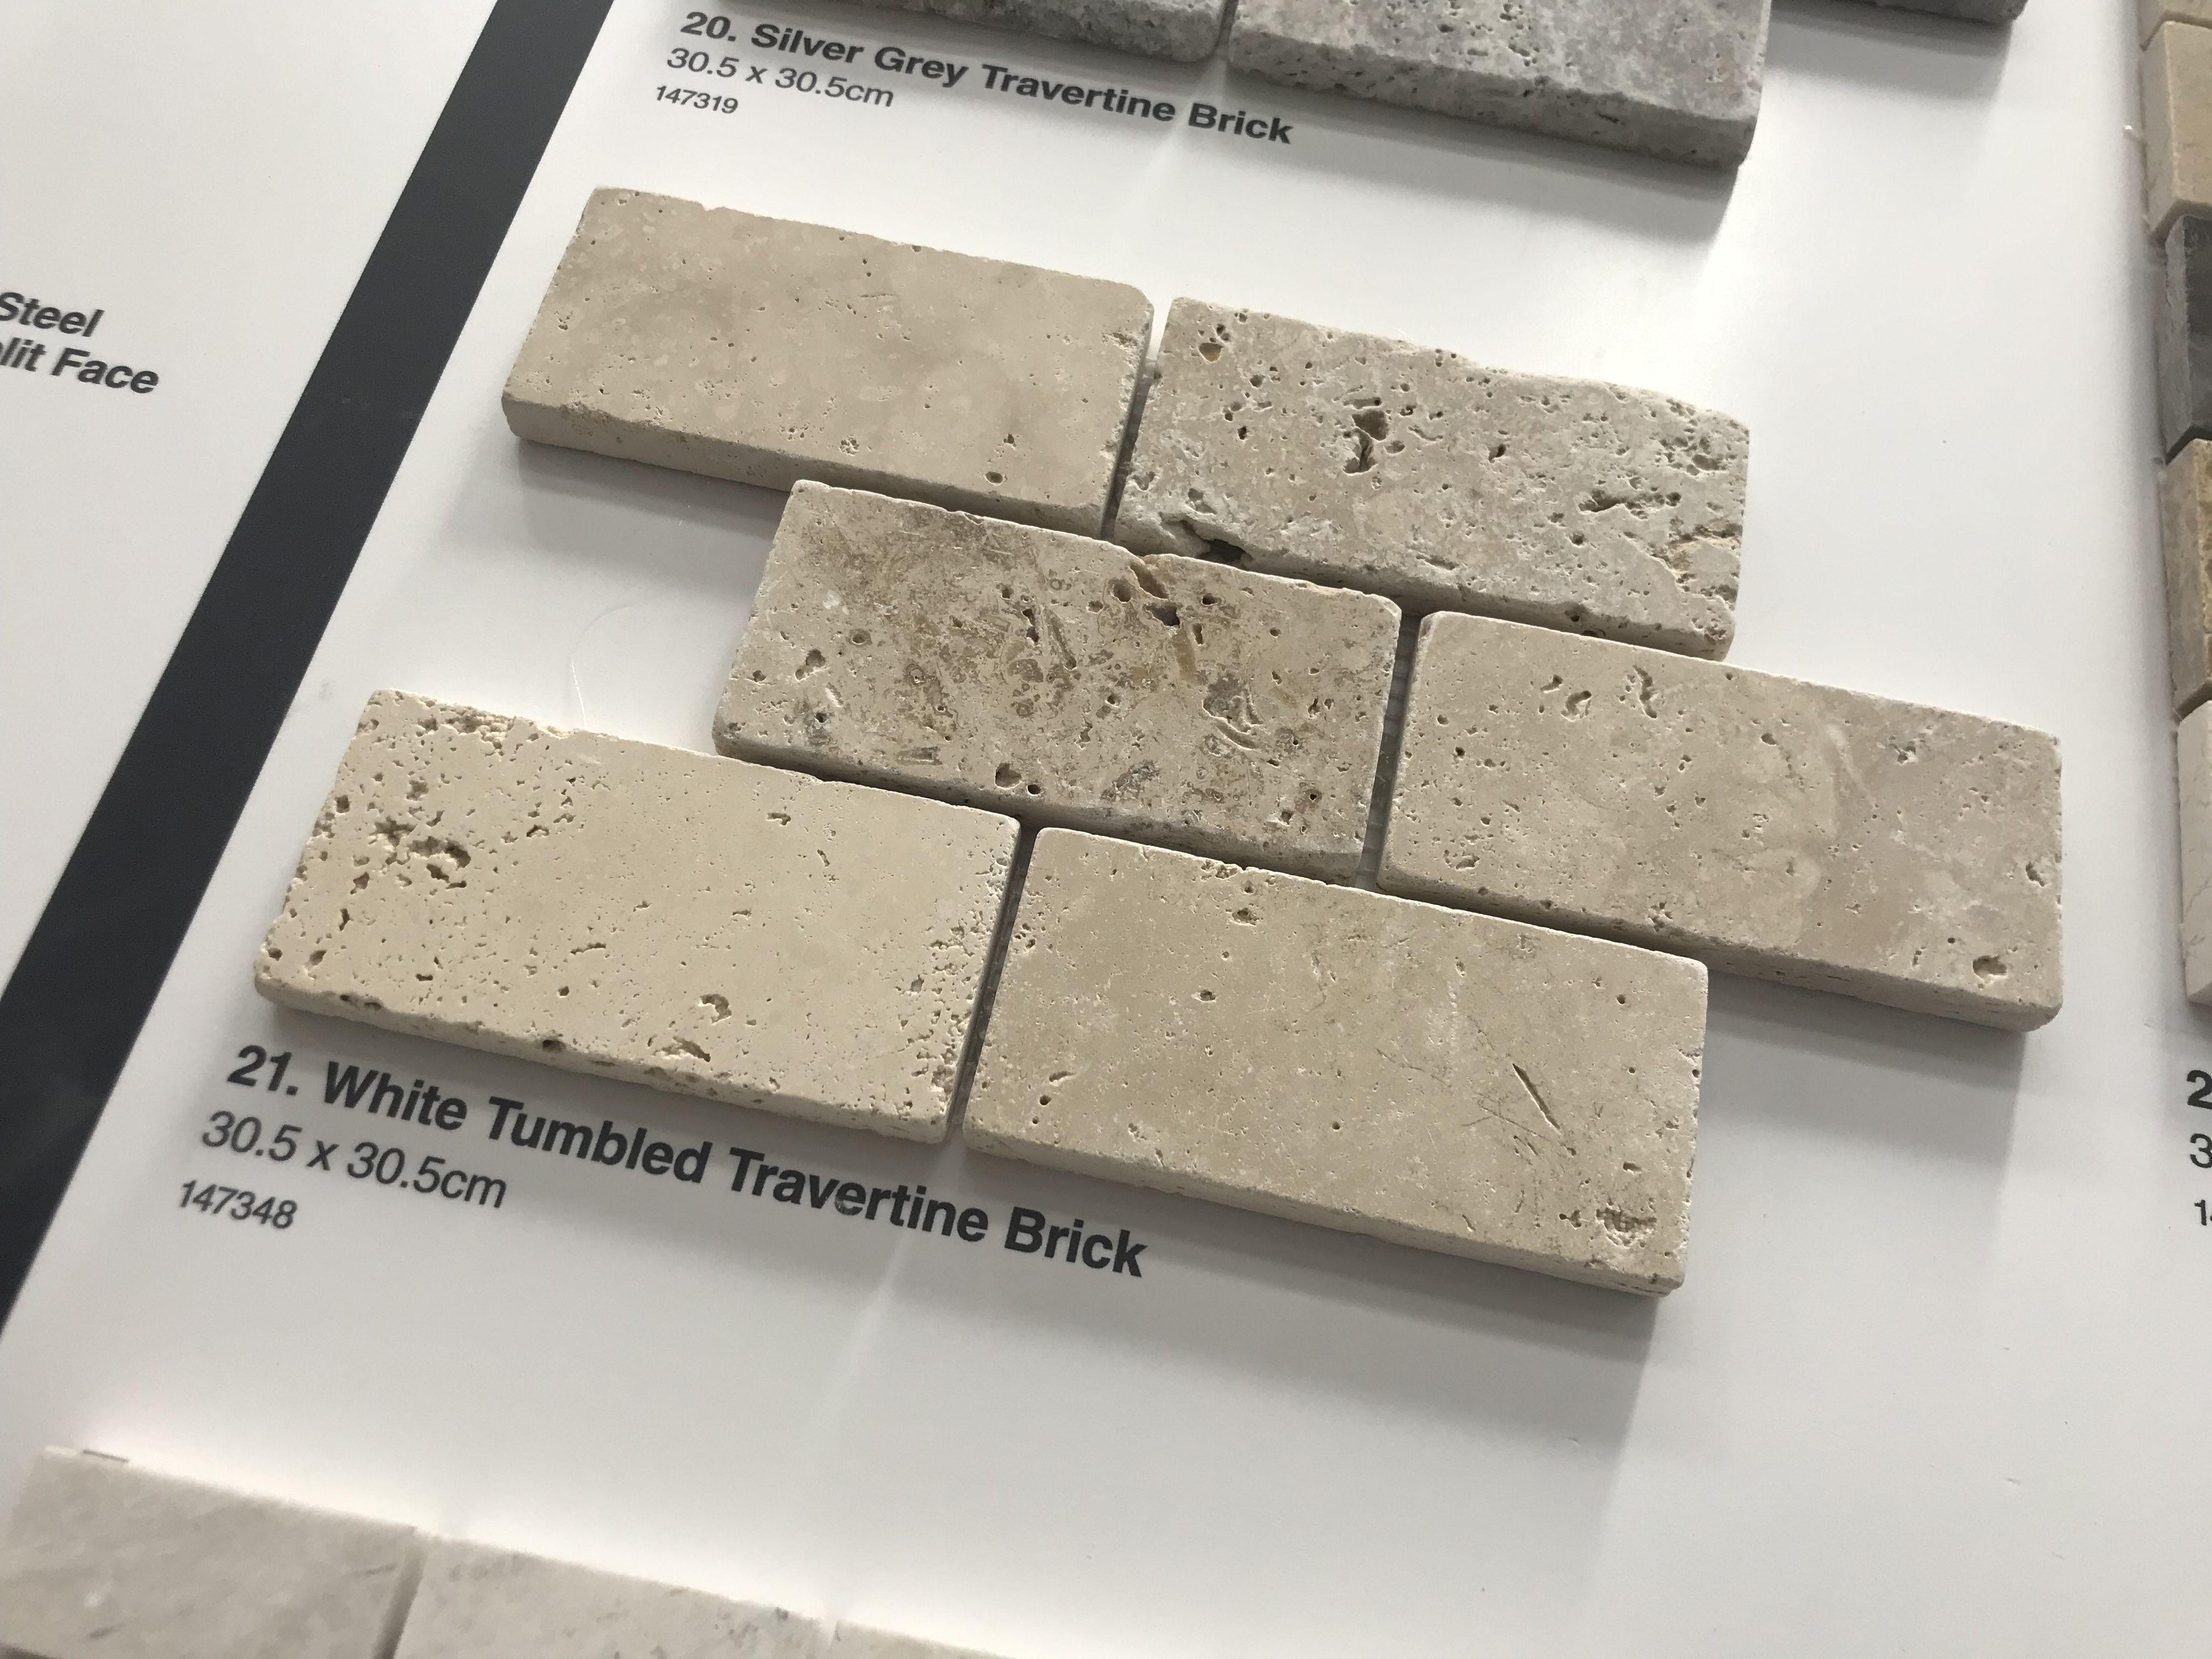 Pin by Lauren Cass on Kitchen Wickes tiles, Tiles, Kitchen